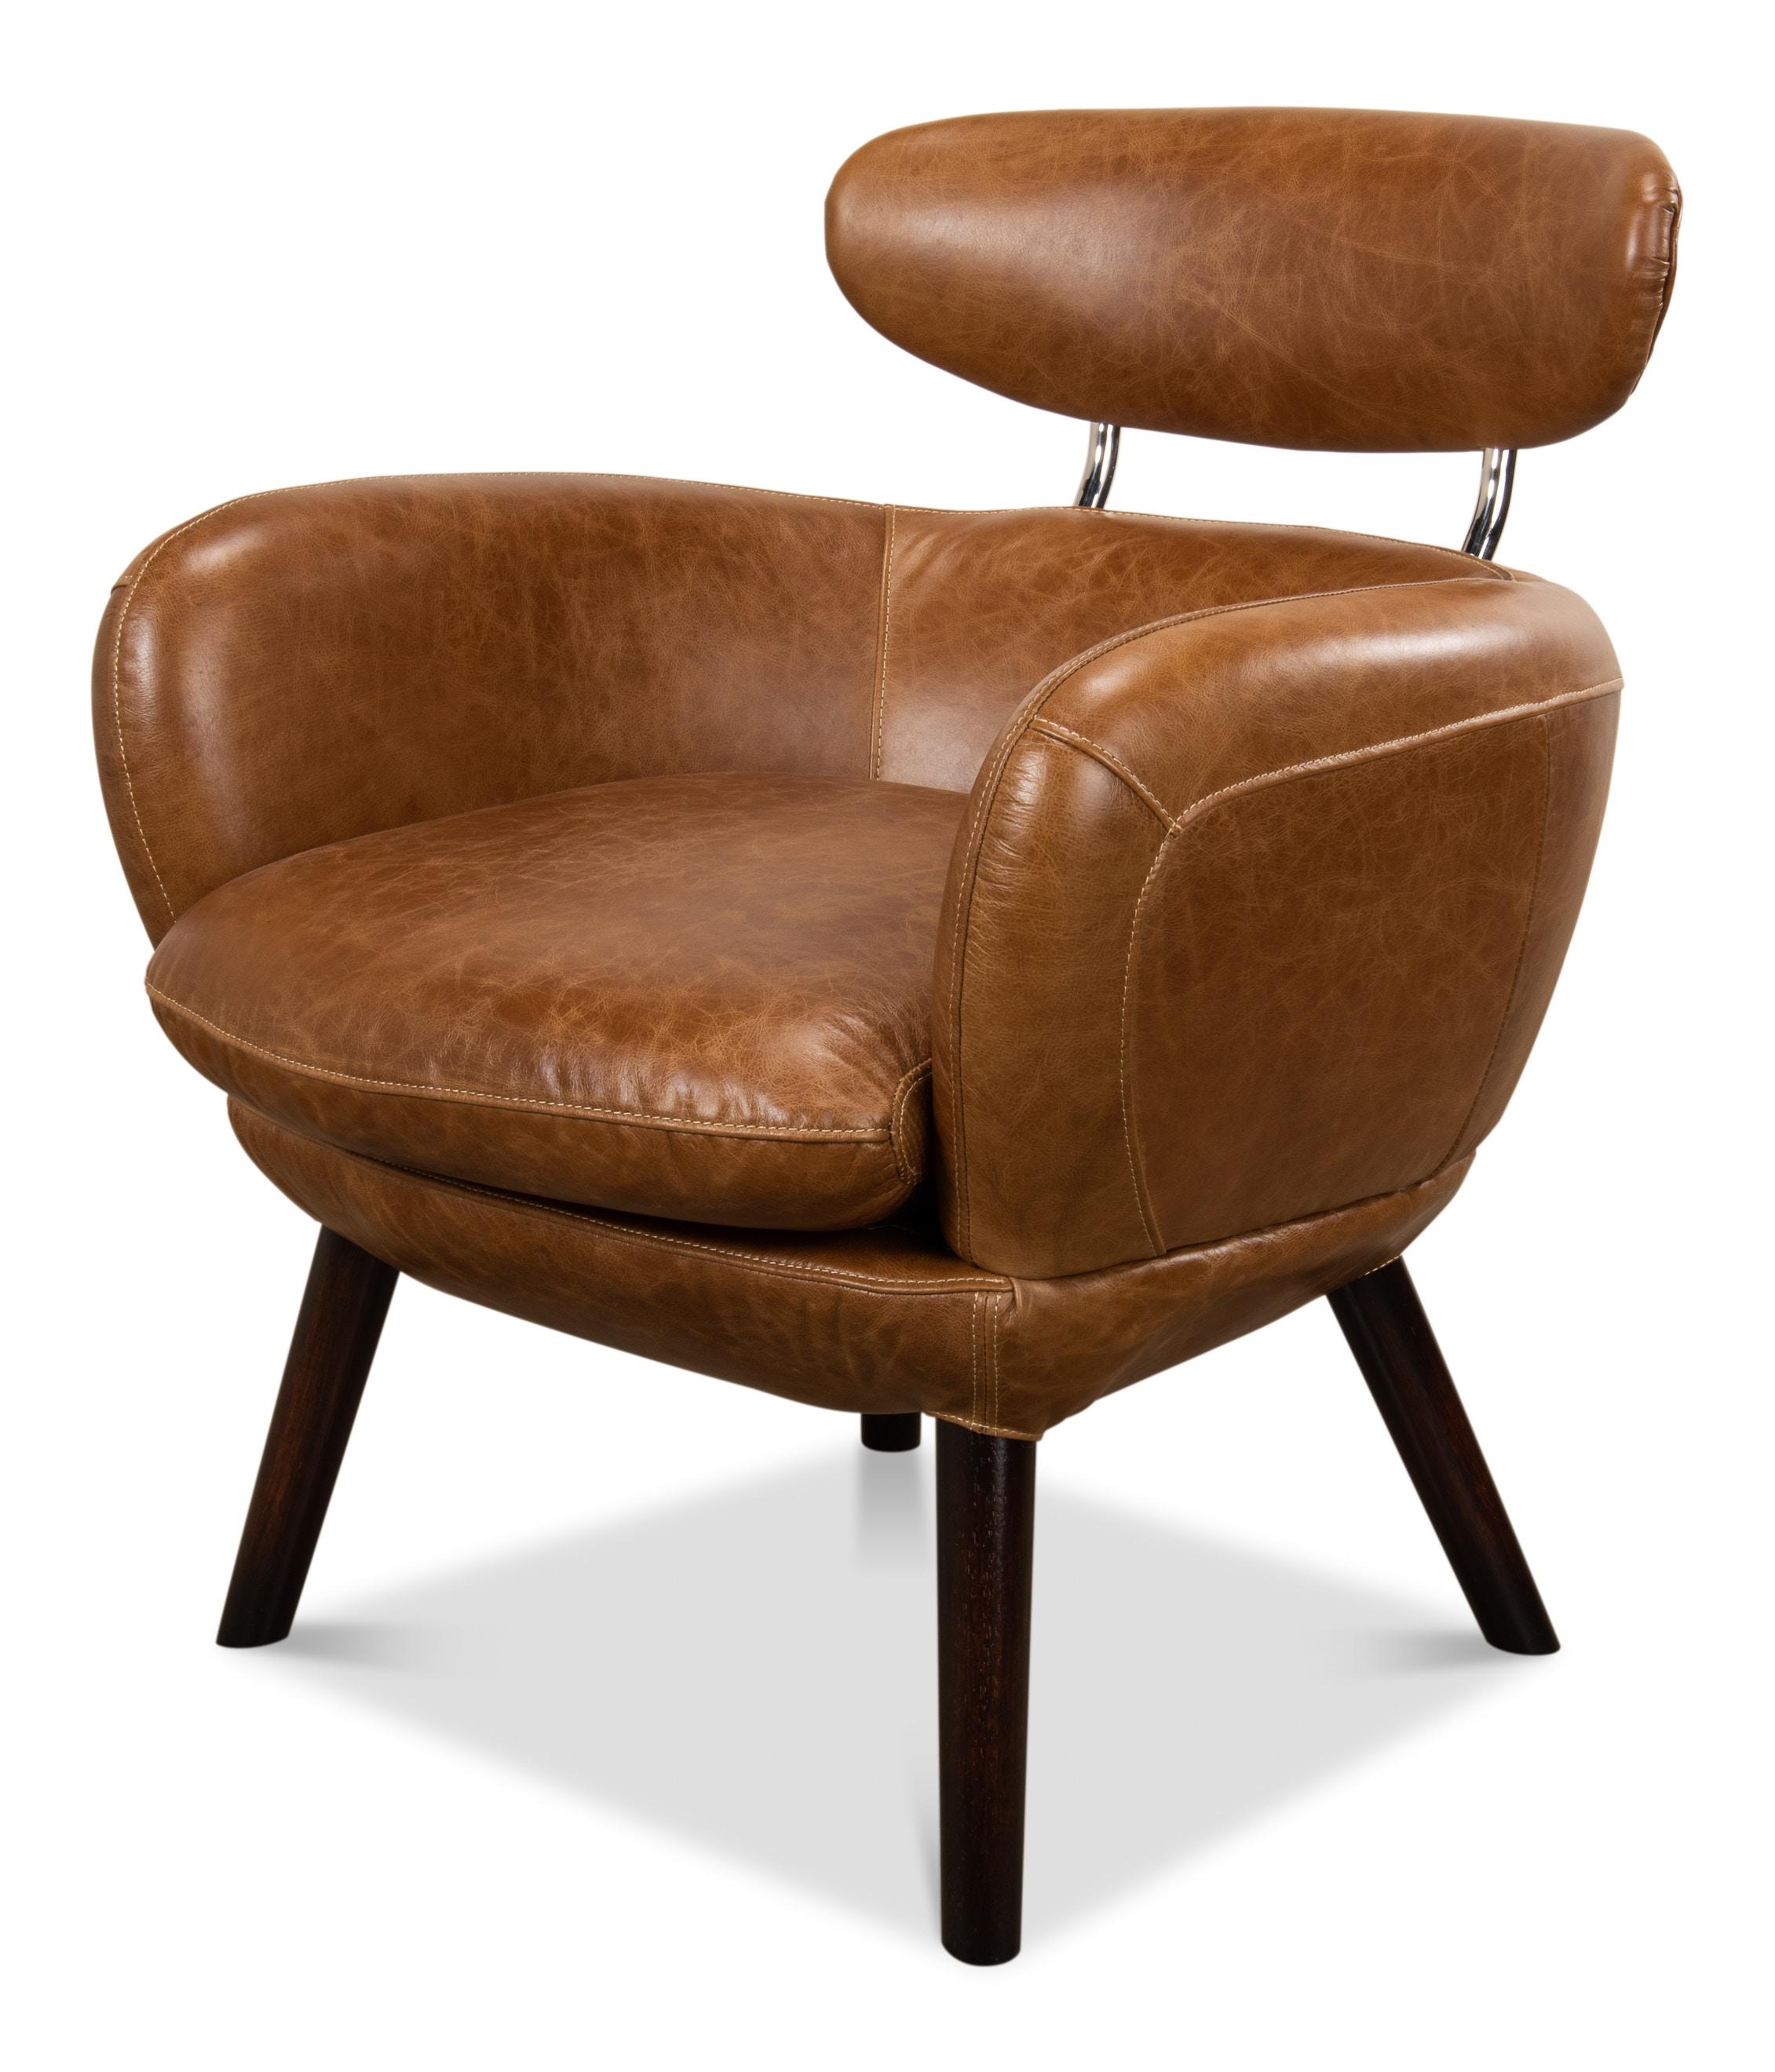 Superieur Sarreid Sinclair Arm Chair 29757 From Walter E. Smithe Furniture + Design